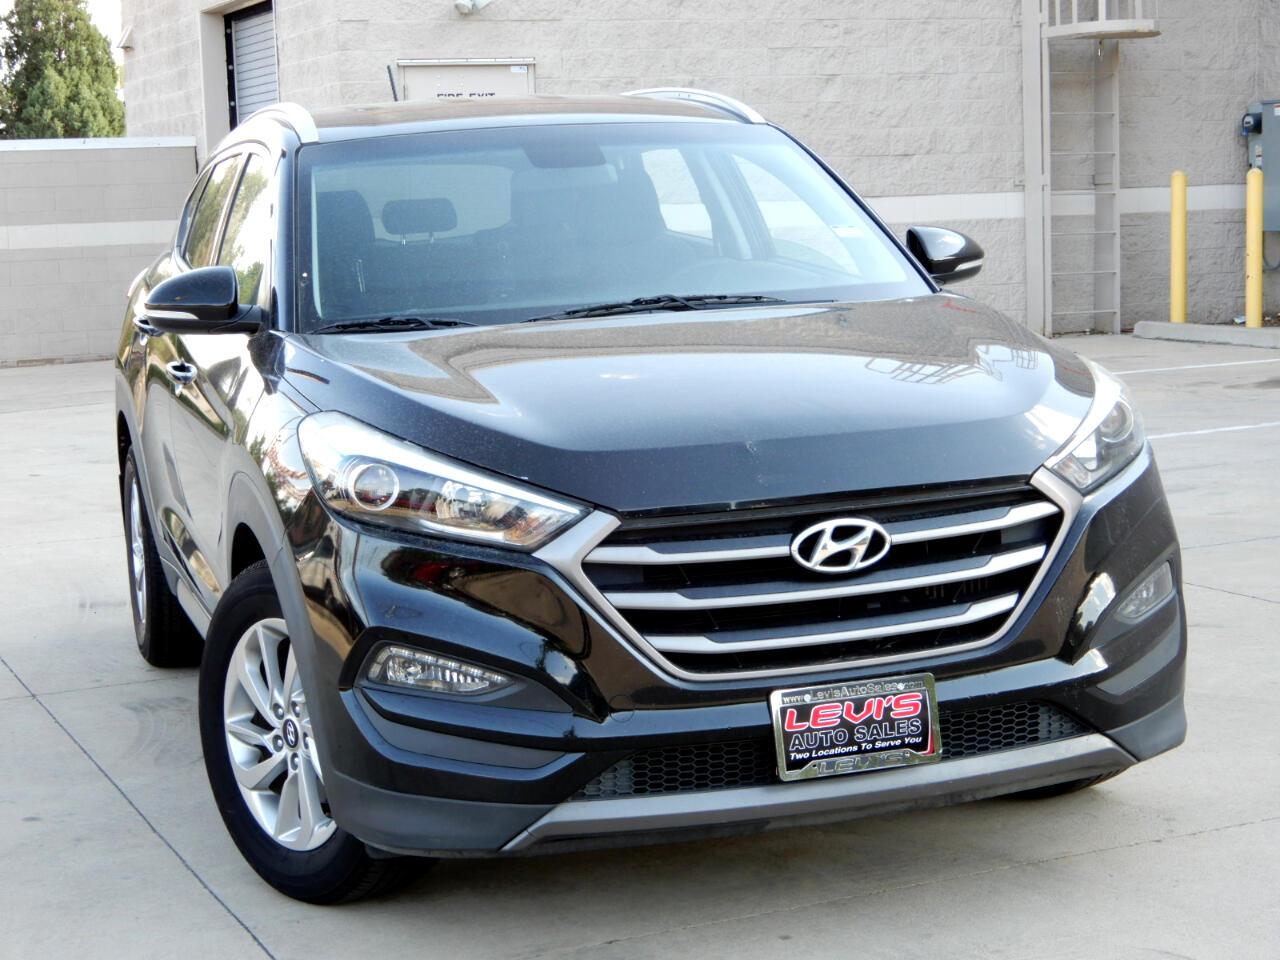 Hyundai Tucson FWD 4dr Eco 2016